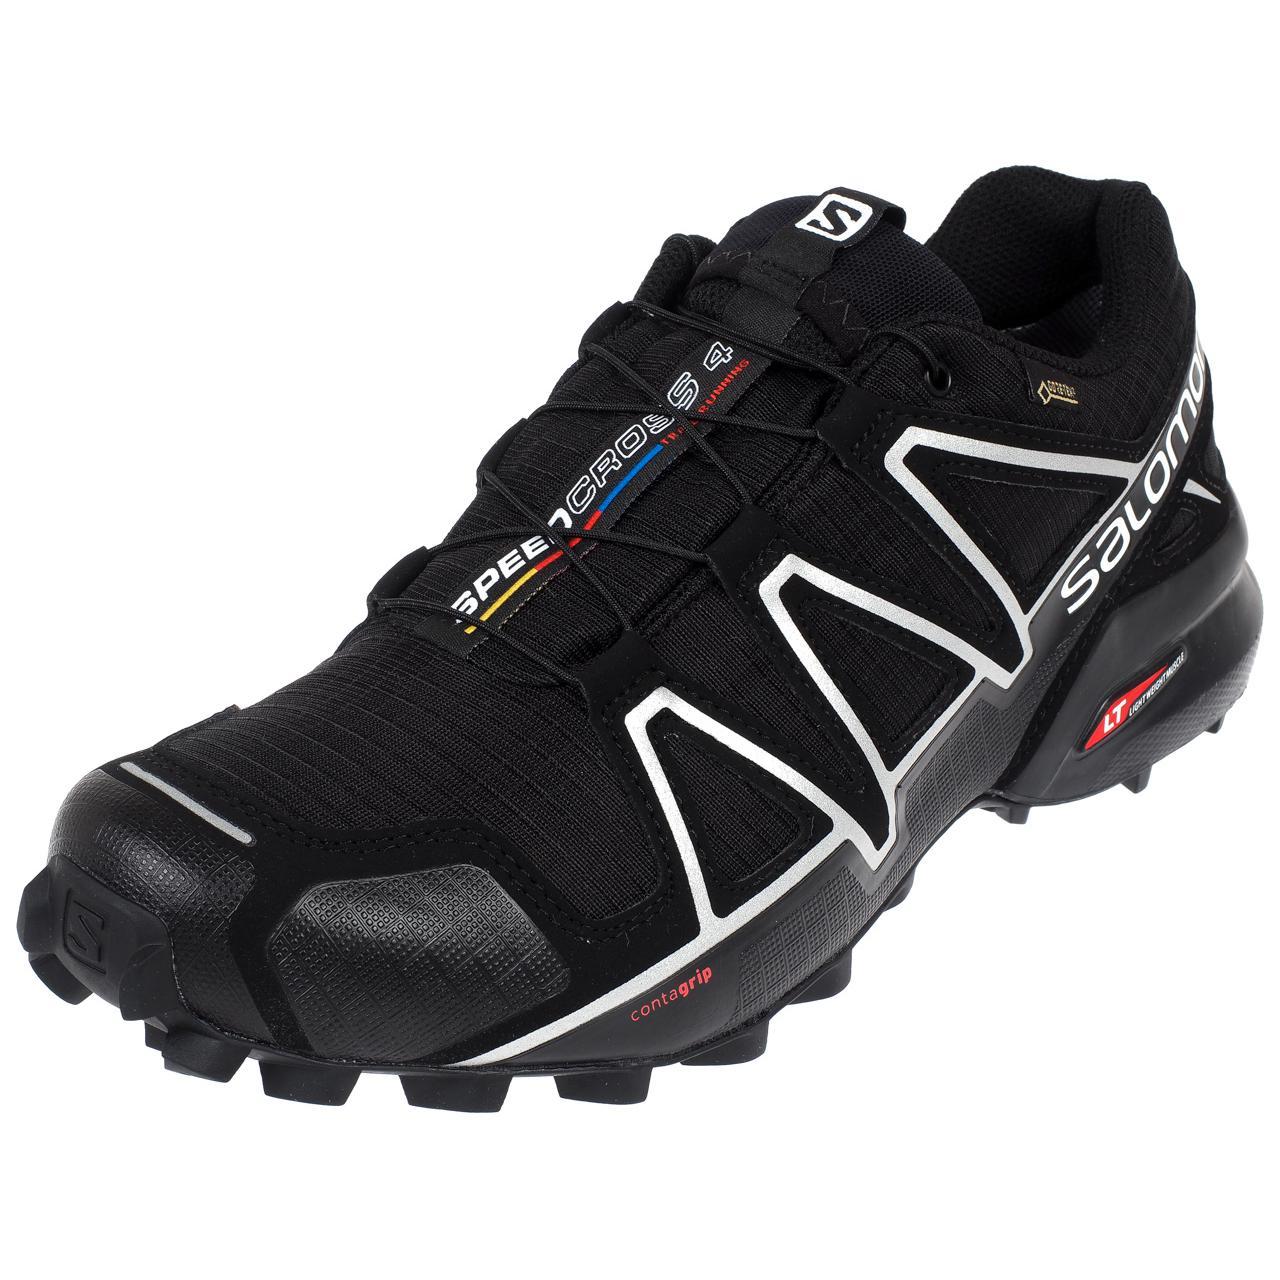 Zapatos-Running-Rastro-Salomon-Speed-Cross-4-GTX-Nr-Run-Negro-24186-Nuevo